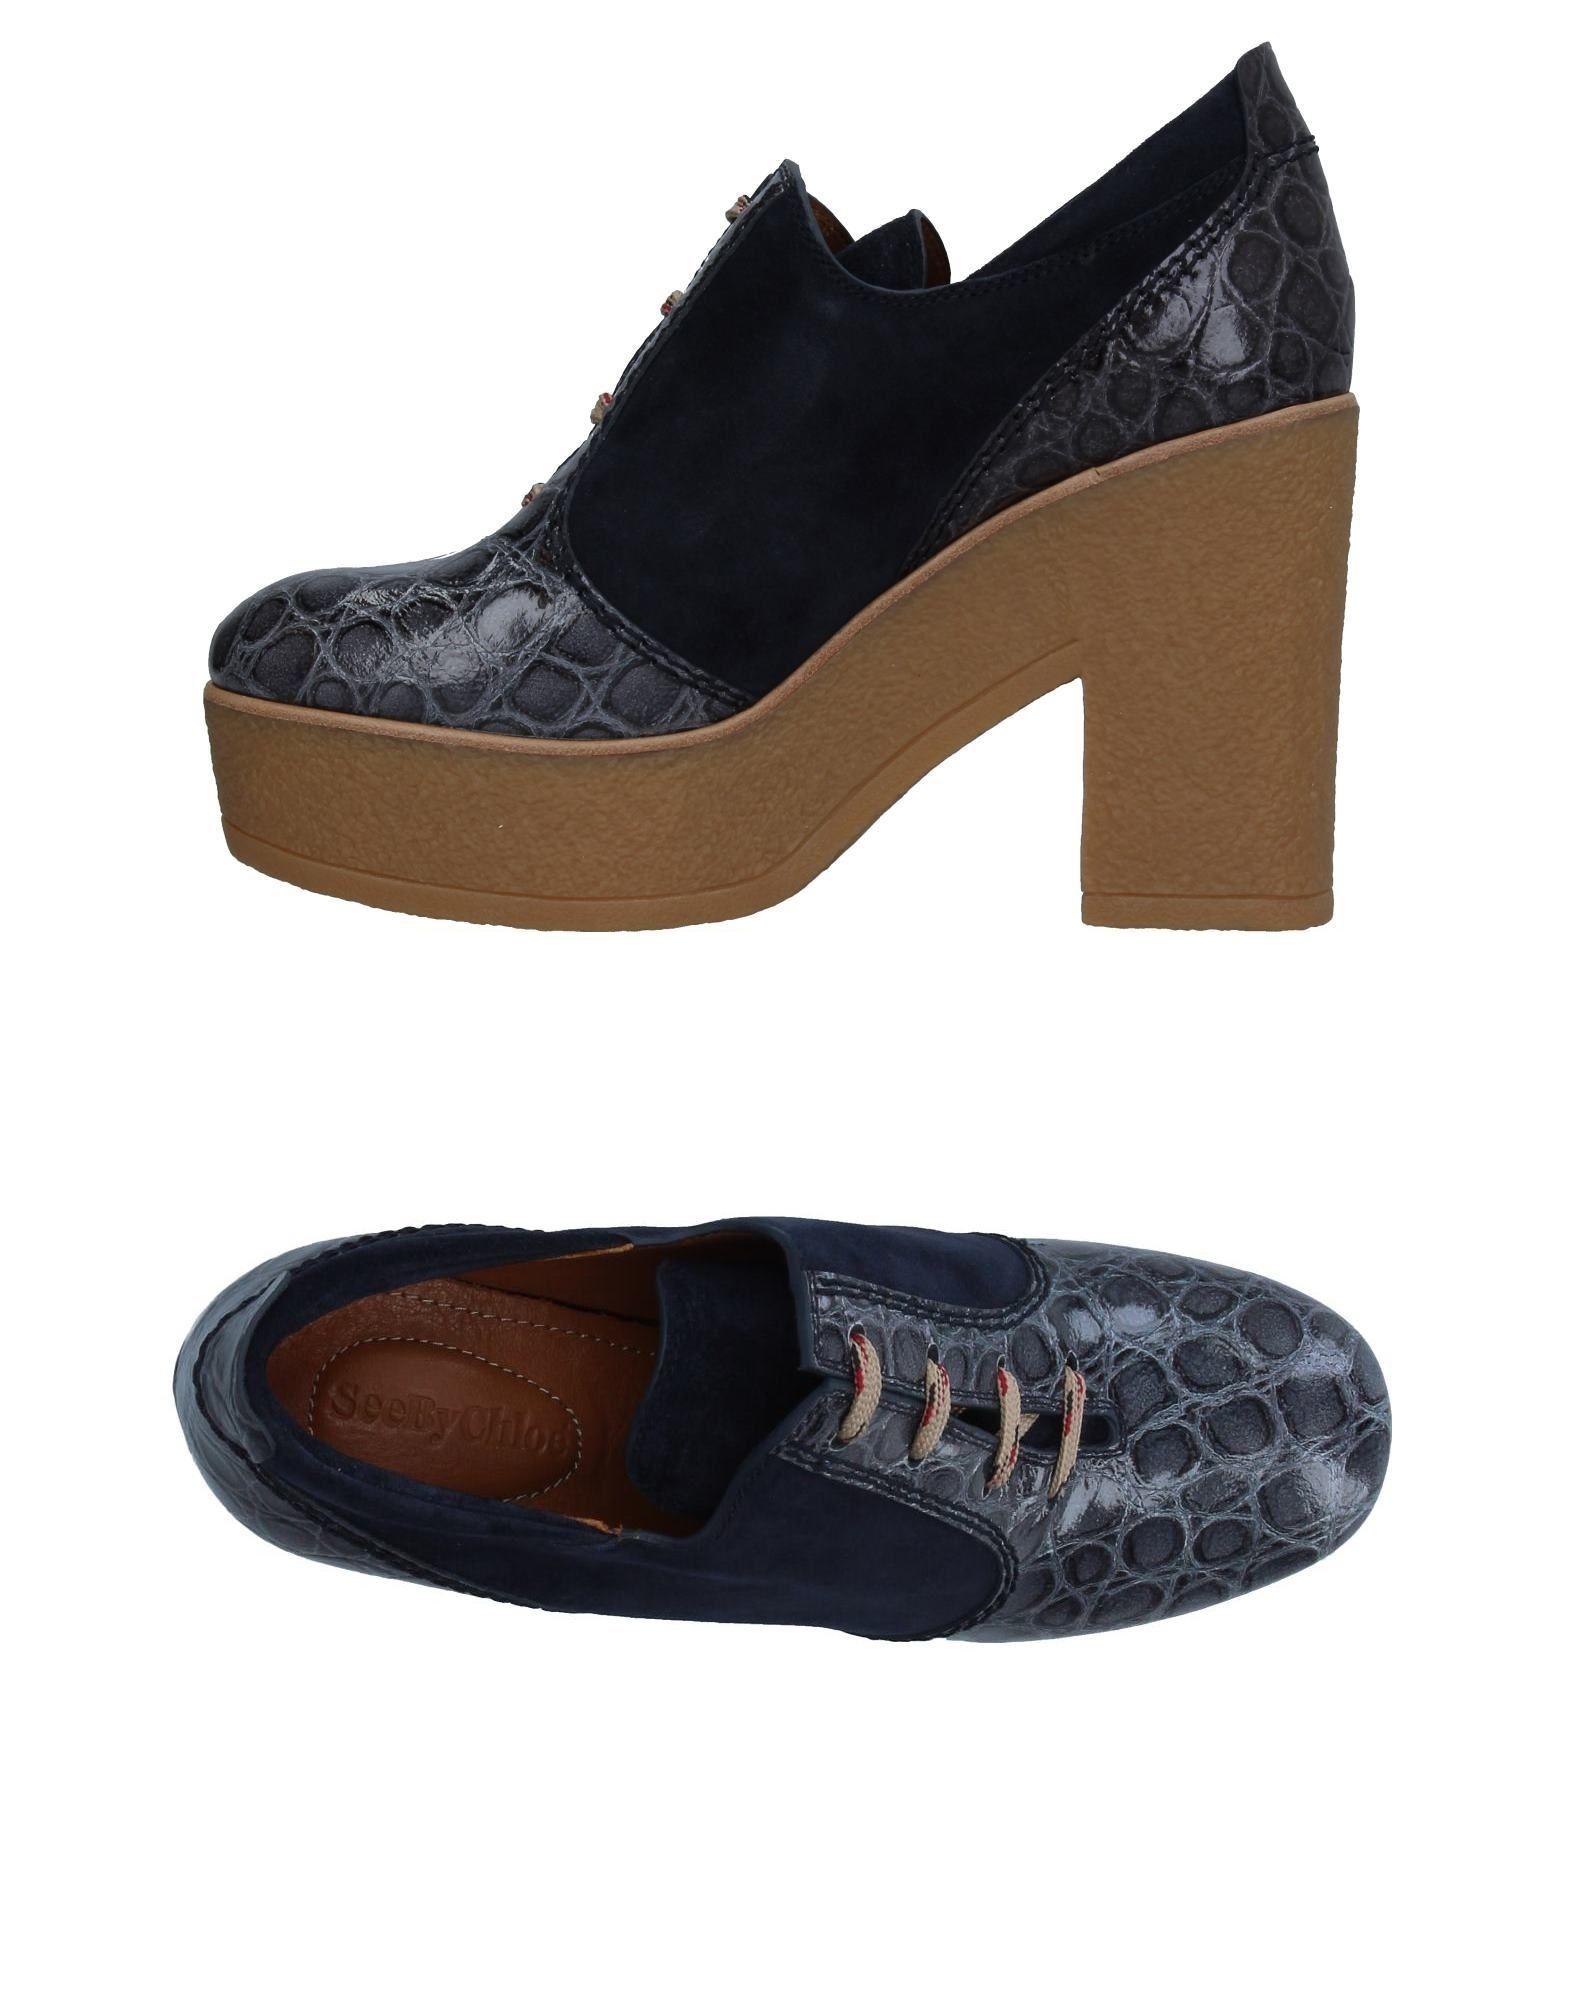 цены на SEE BY CHLOÉ Обувь на шнурках в интернет-магазинах